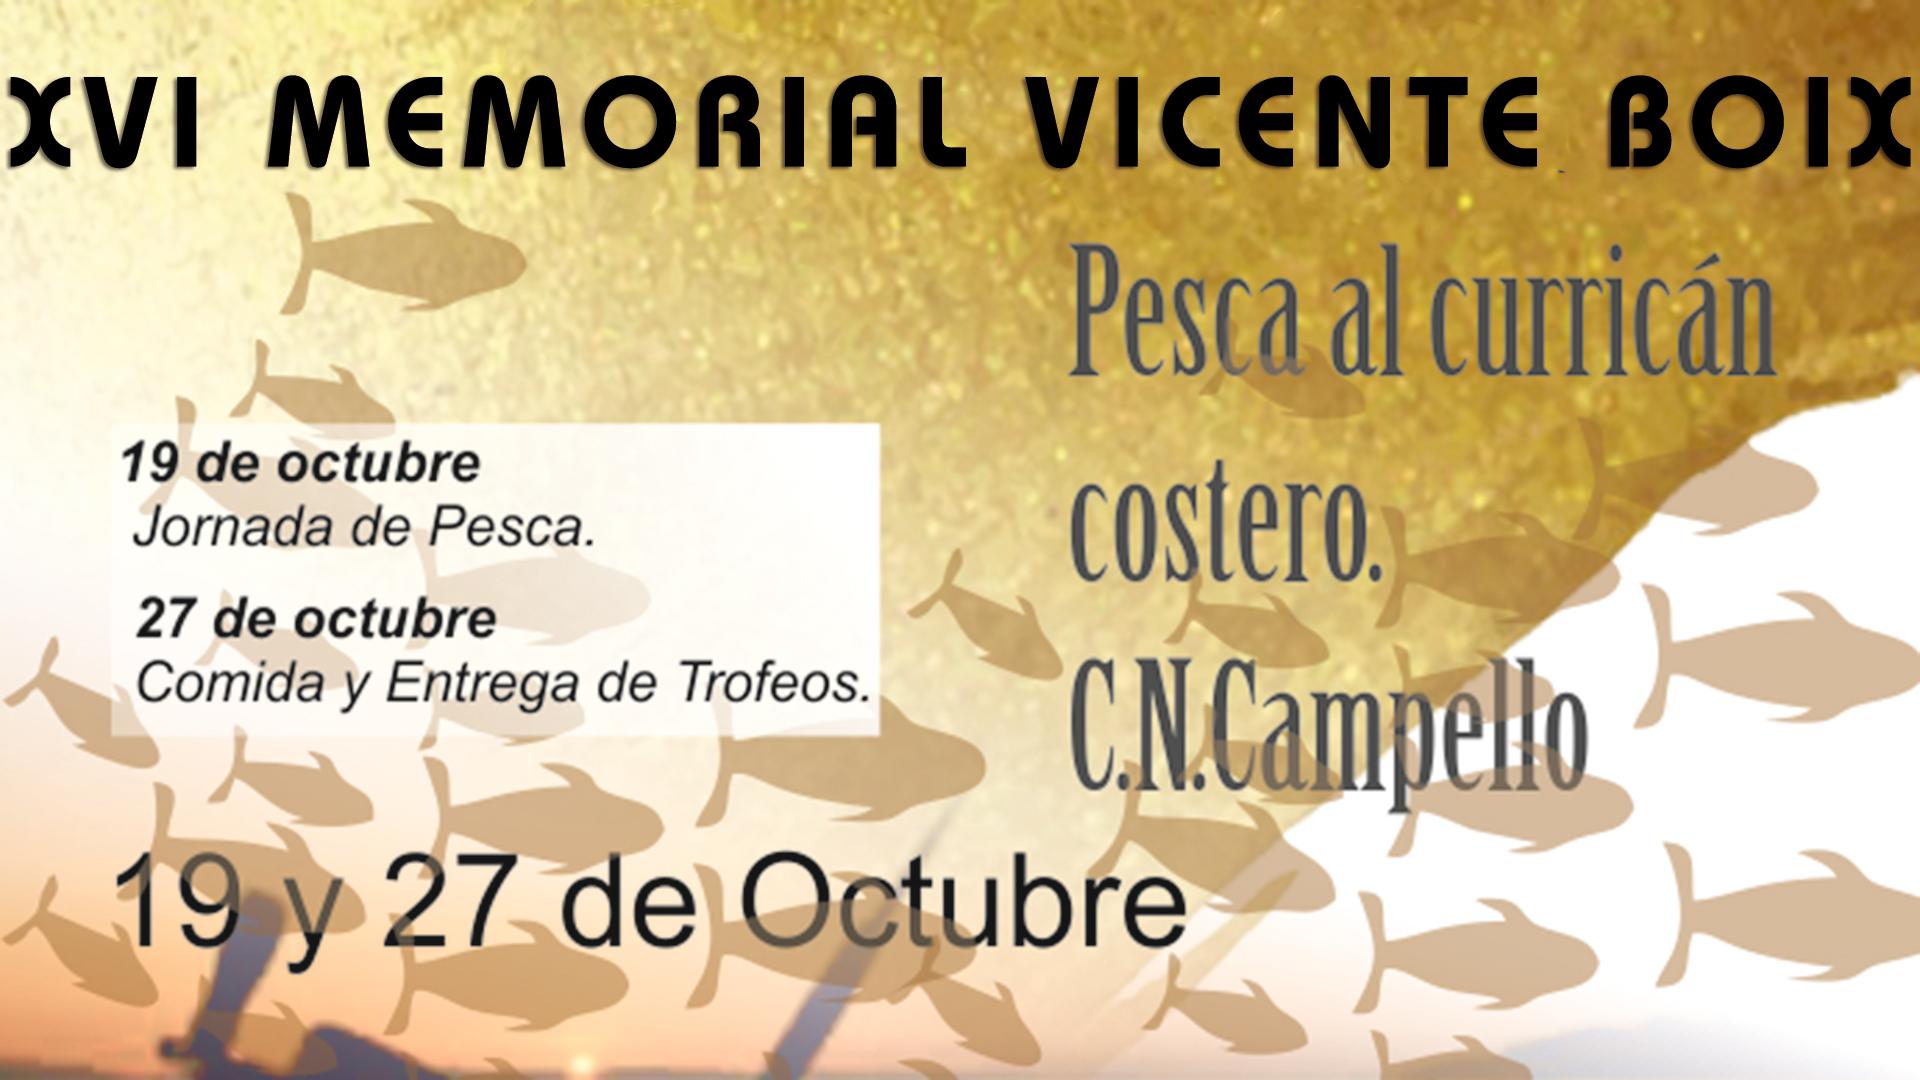 XVI Memorial Vicente Boix - Club Náutico Campello